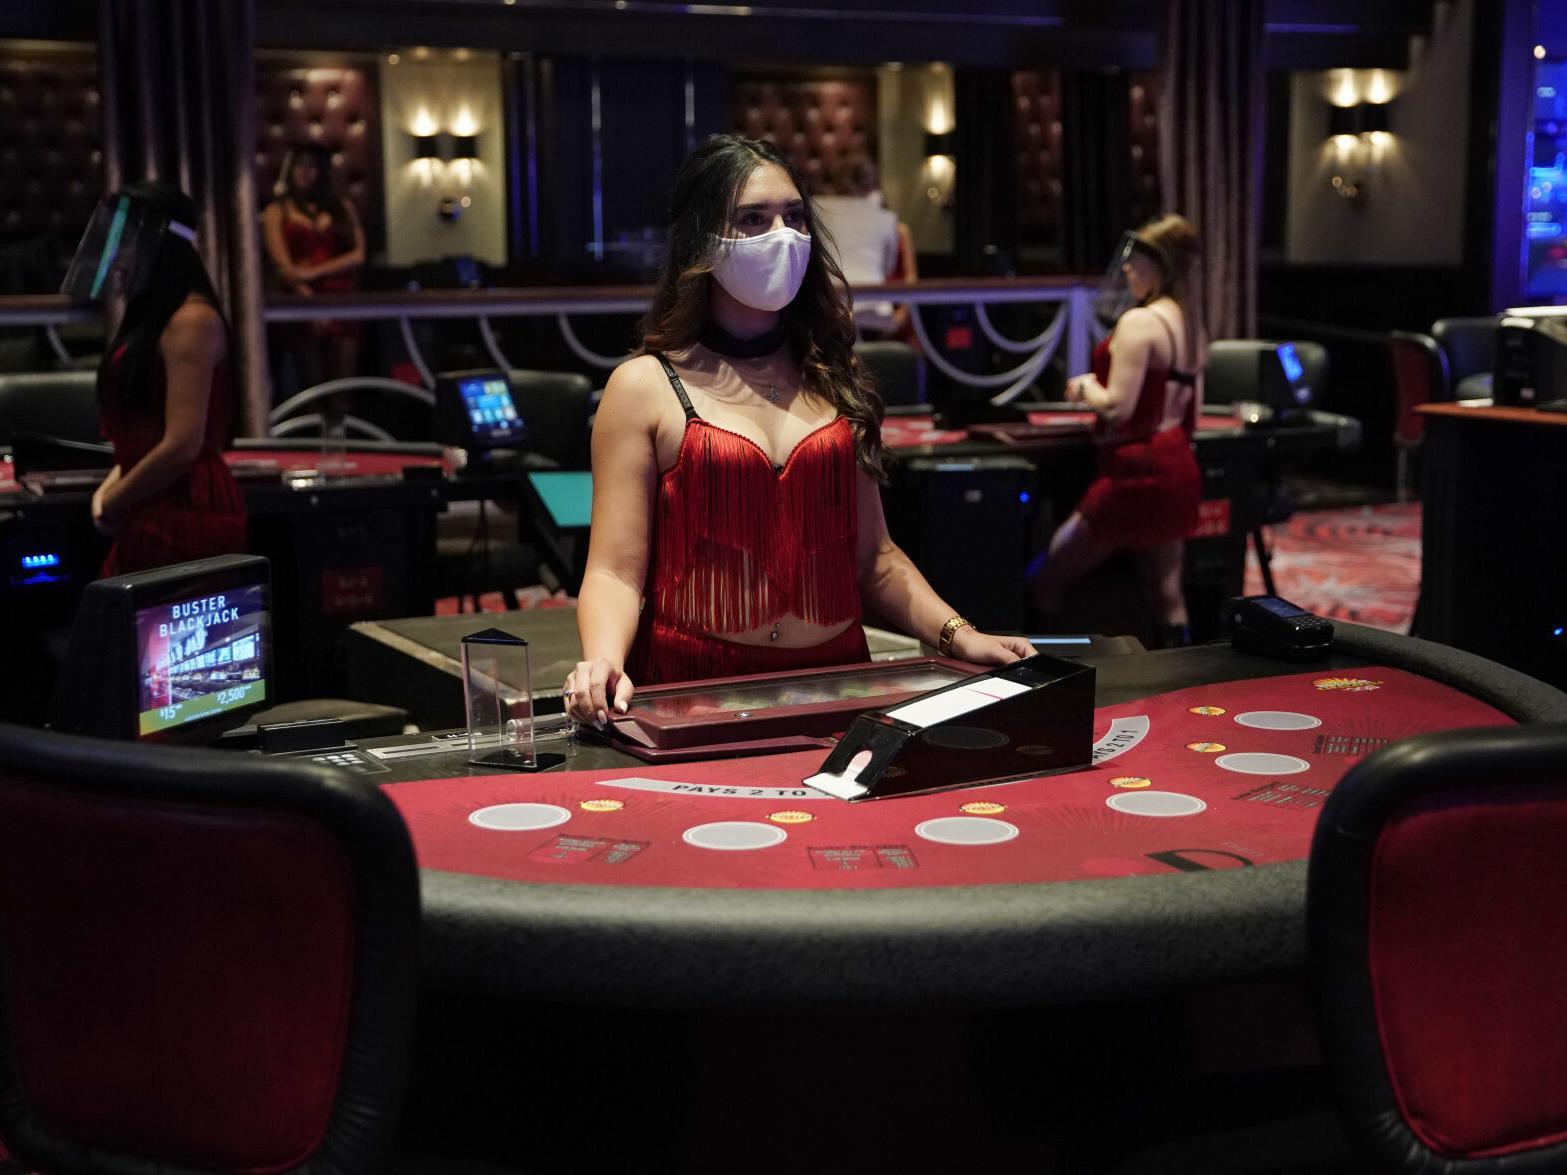 dg百家樂試玩 自動破解程式 來取得贏家人生,註冊即可擁有168免費體驗金可玩,還有美女無限直播可以看